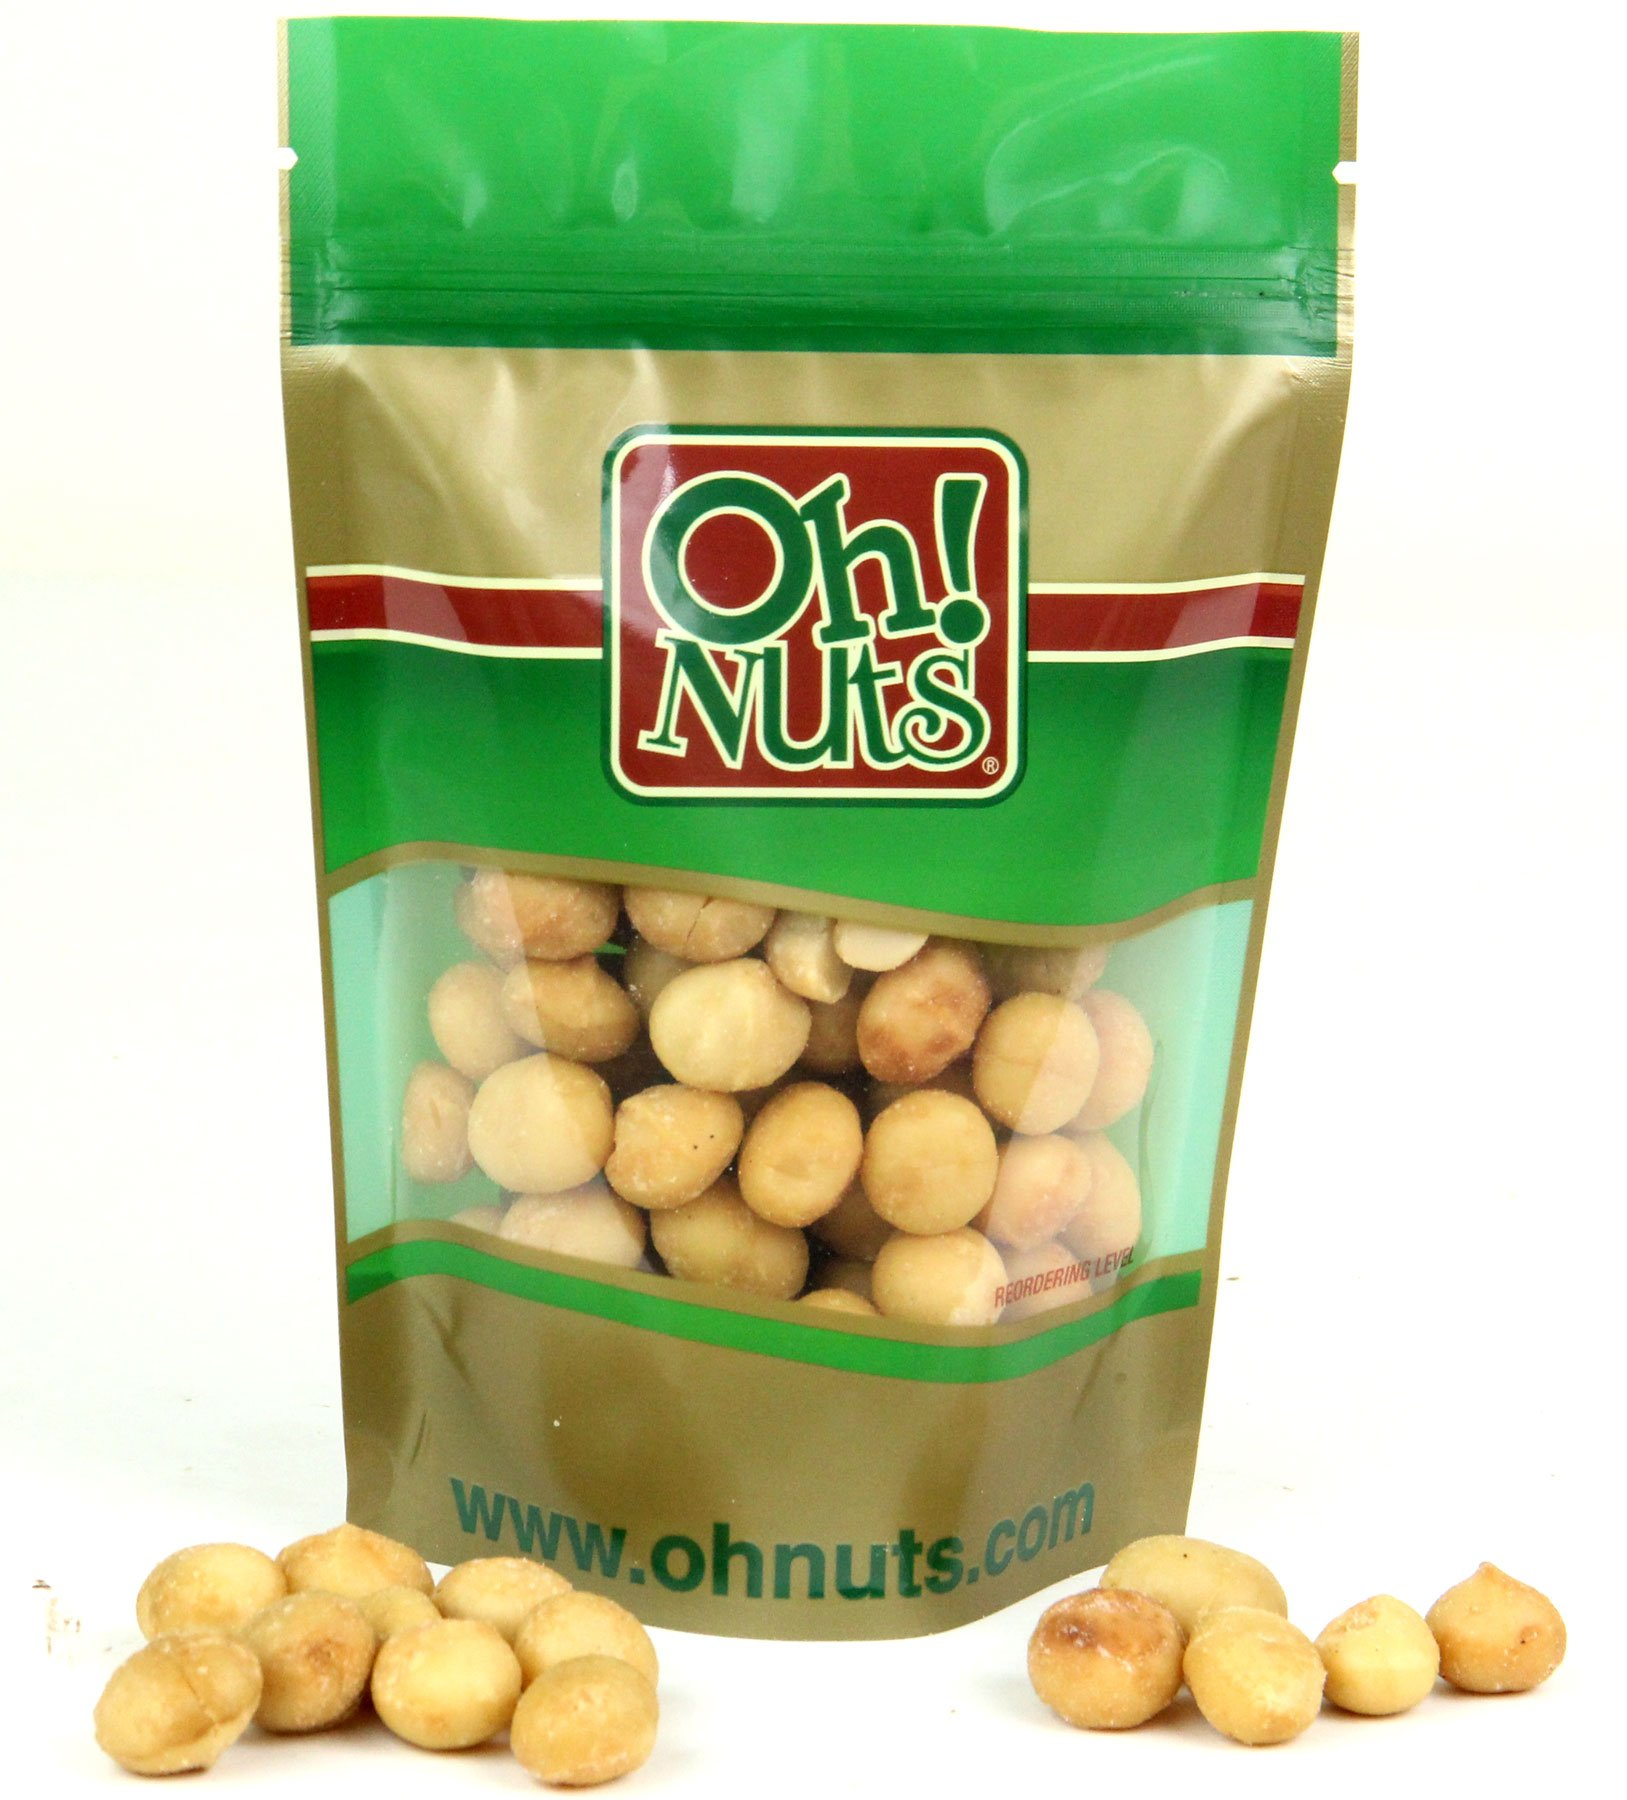 Roasted Salted Hawaiian Macadamia Nuts 5 pounds - Oh! Nuts